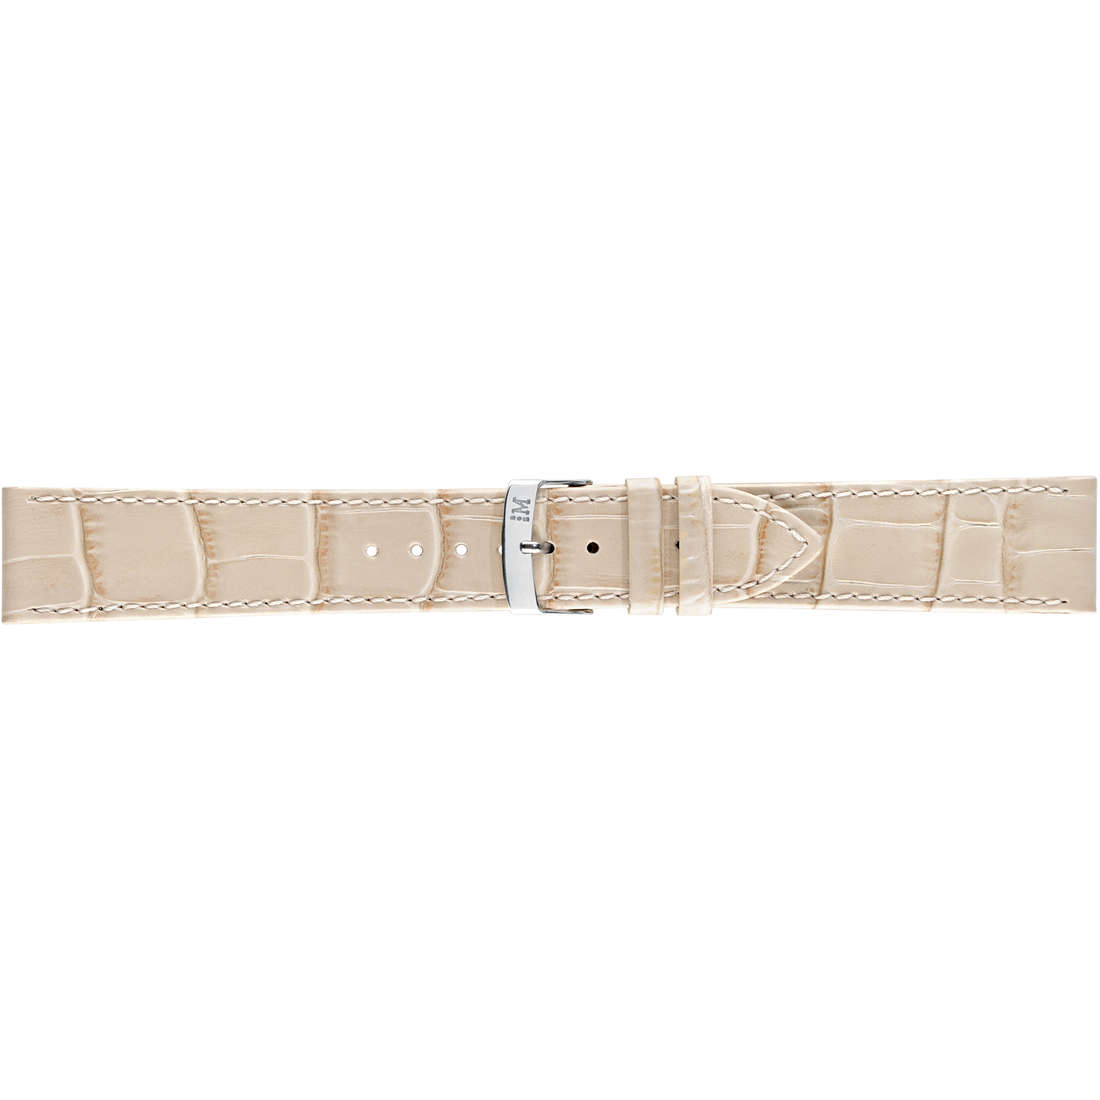 watch watch bands watch straps man Morellato Performance A01X2524656326CR16